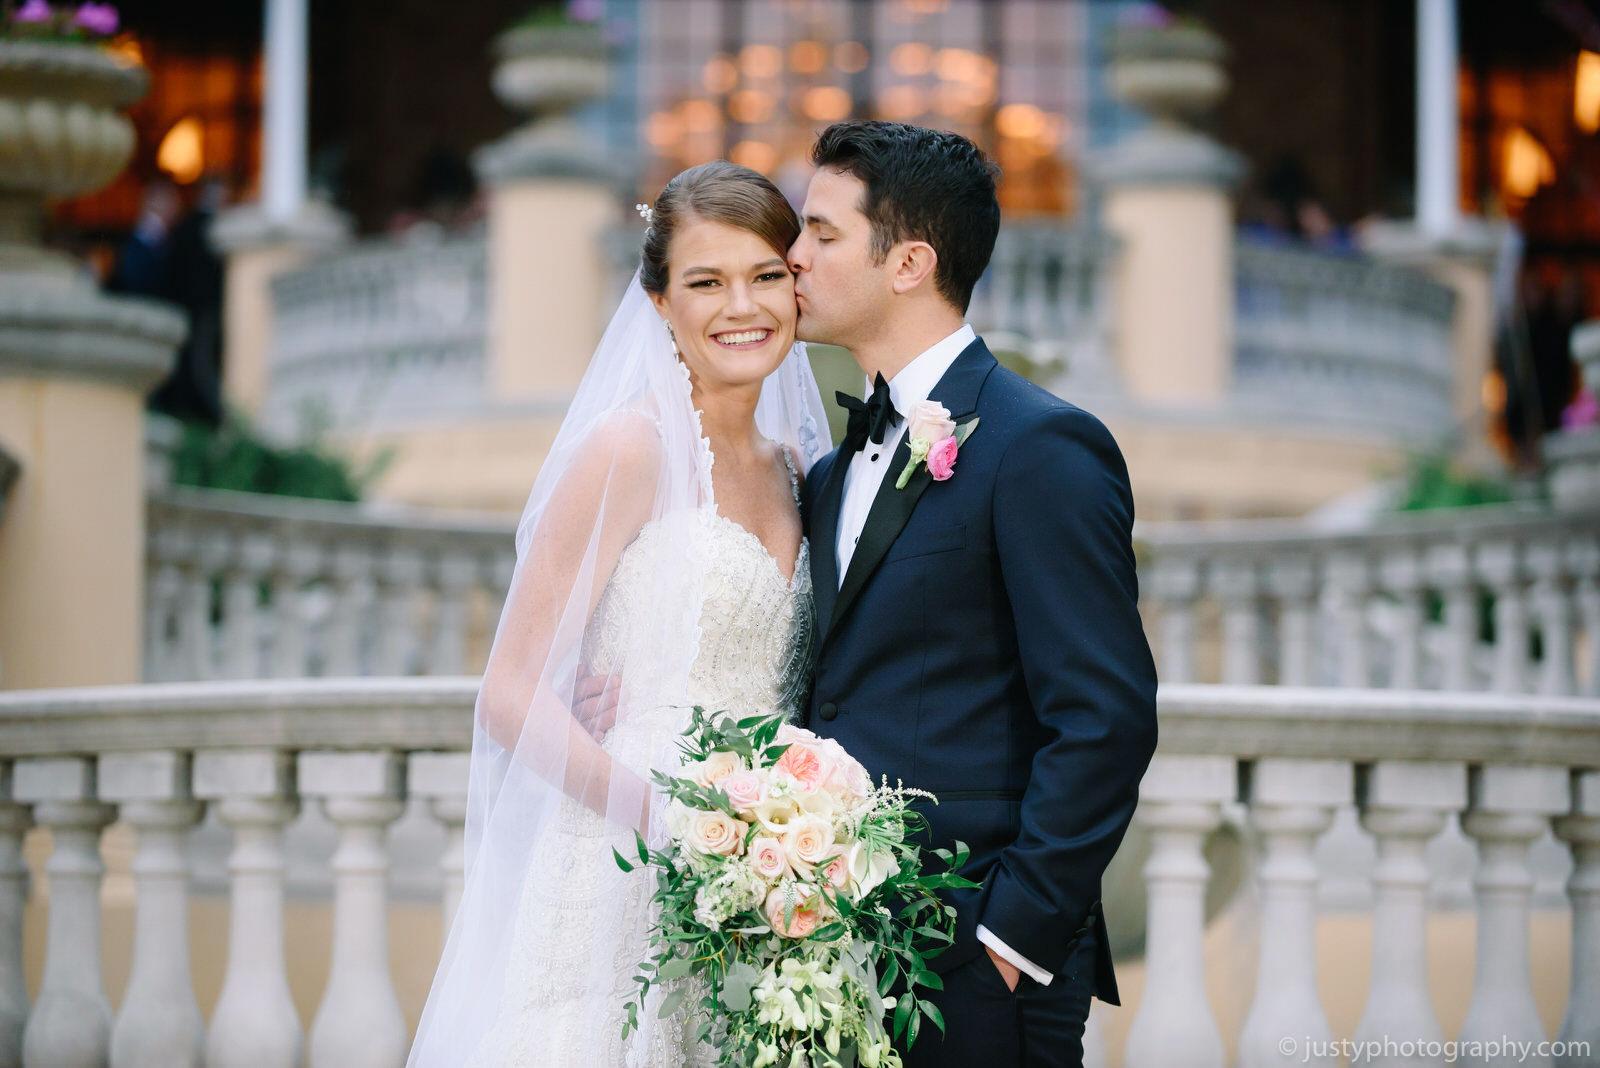 Omni Shoreham wedding photos-washington-dc-wedding-venues (145 of 171).jpg